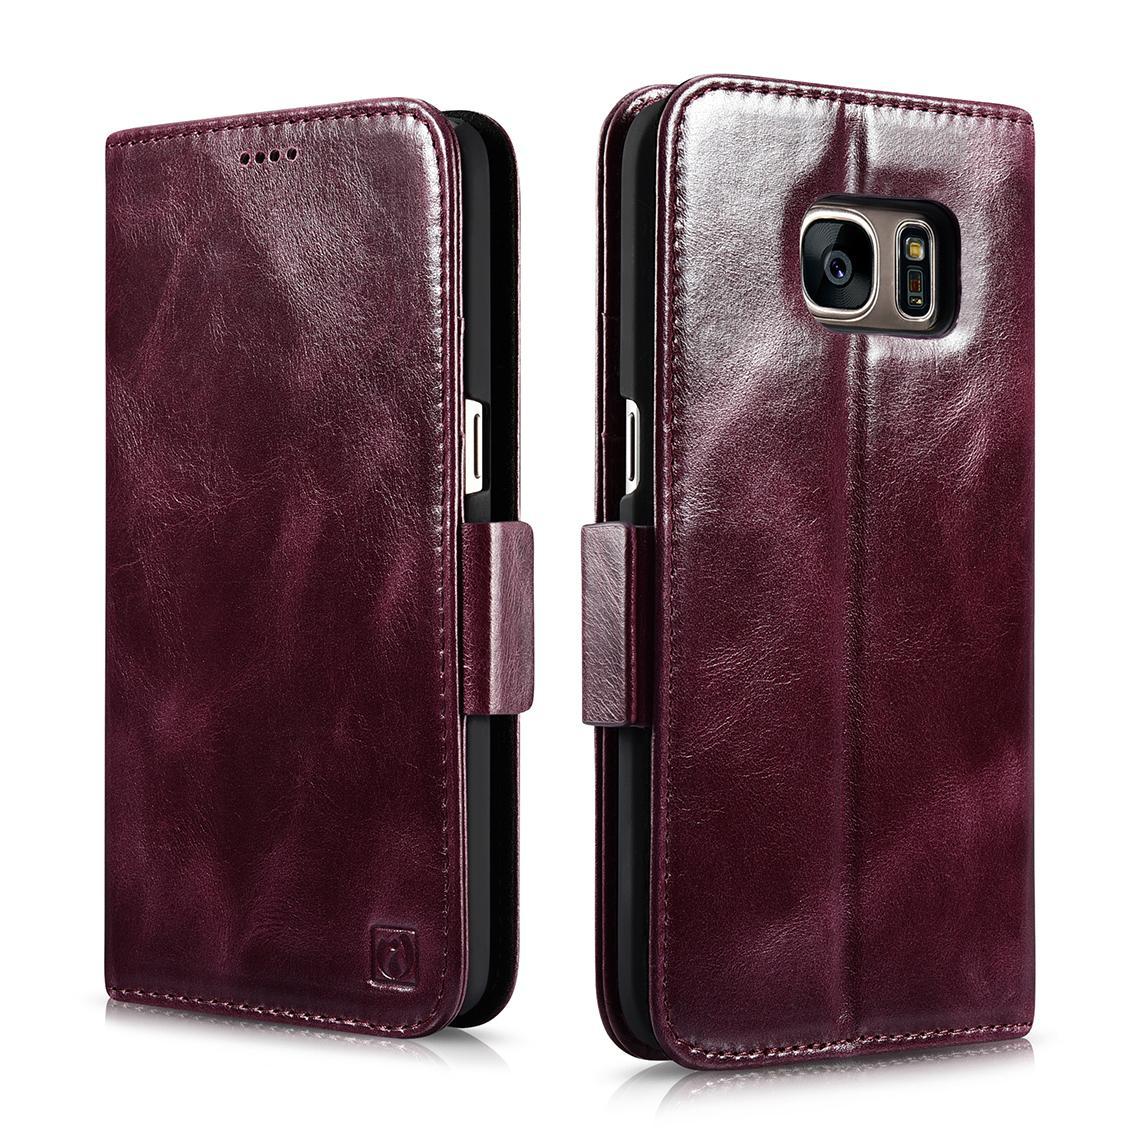 iCarer Samsung Galaxy S7 Silmarillion Leather Detachable 2in1 Wallet Folio Case 1